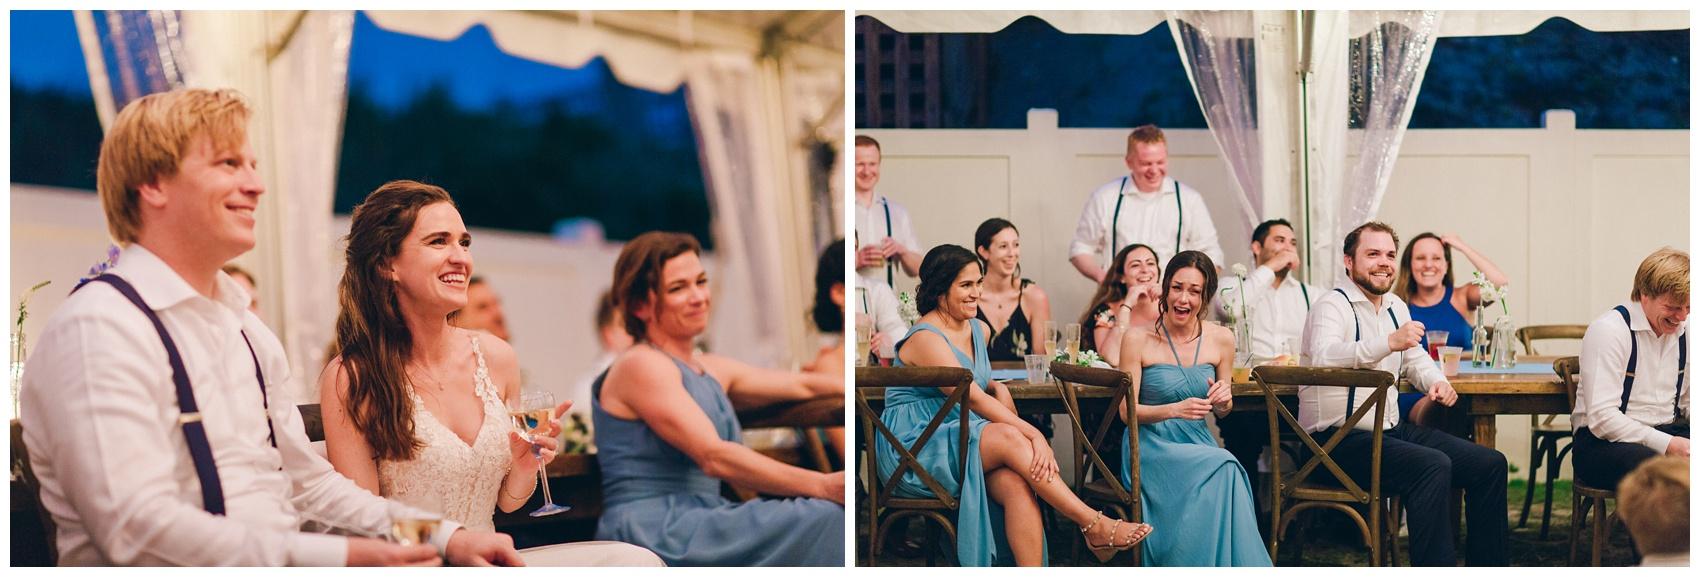 Outer-Banks-Corolla-Wedding_0118.jpg